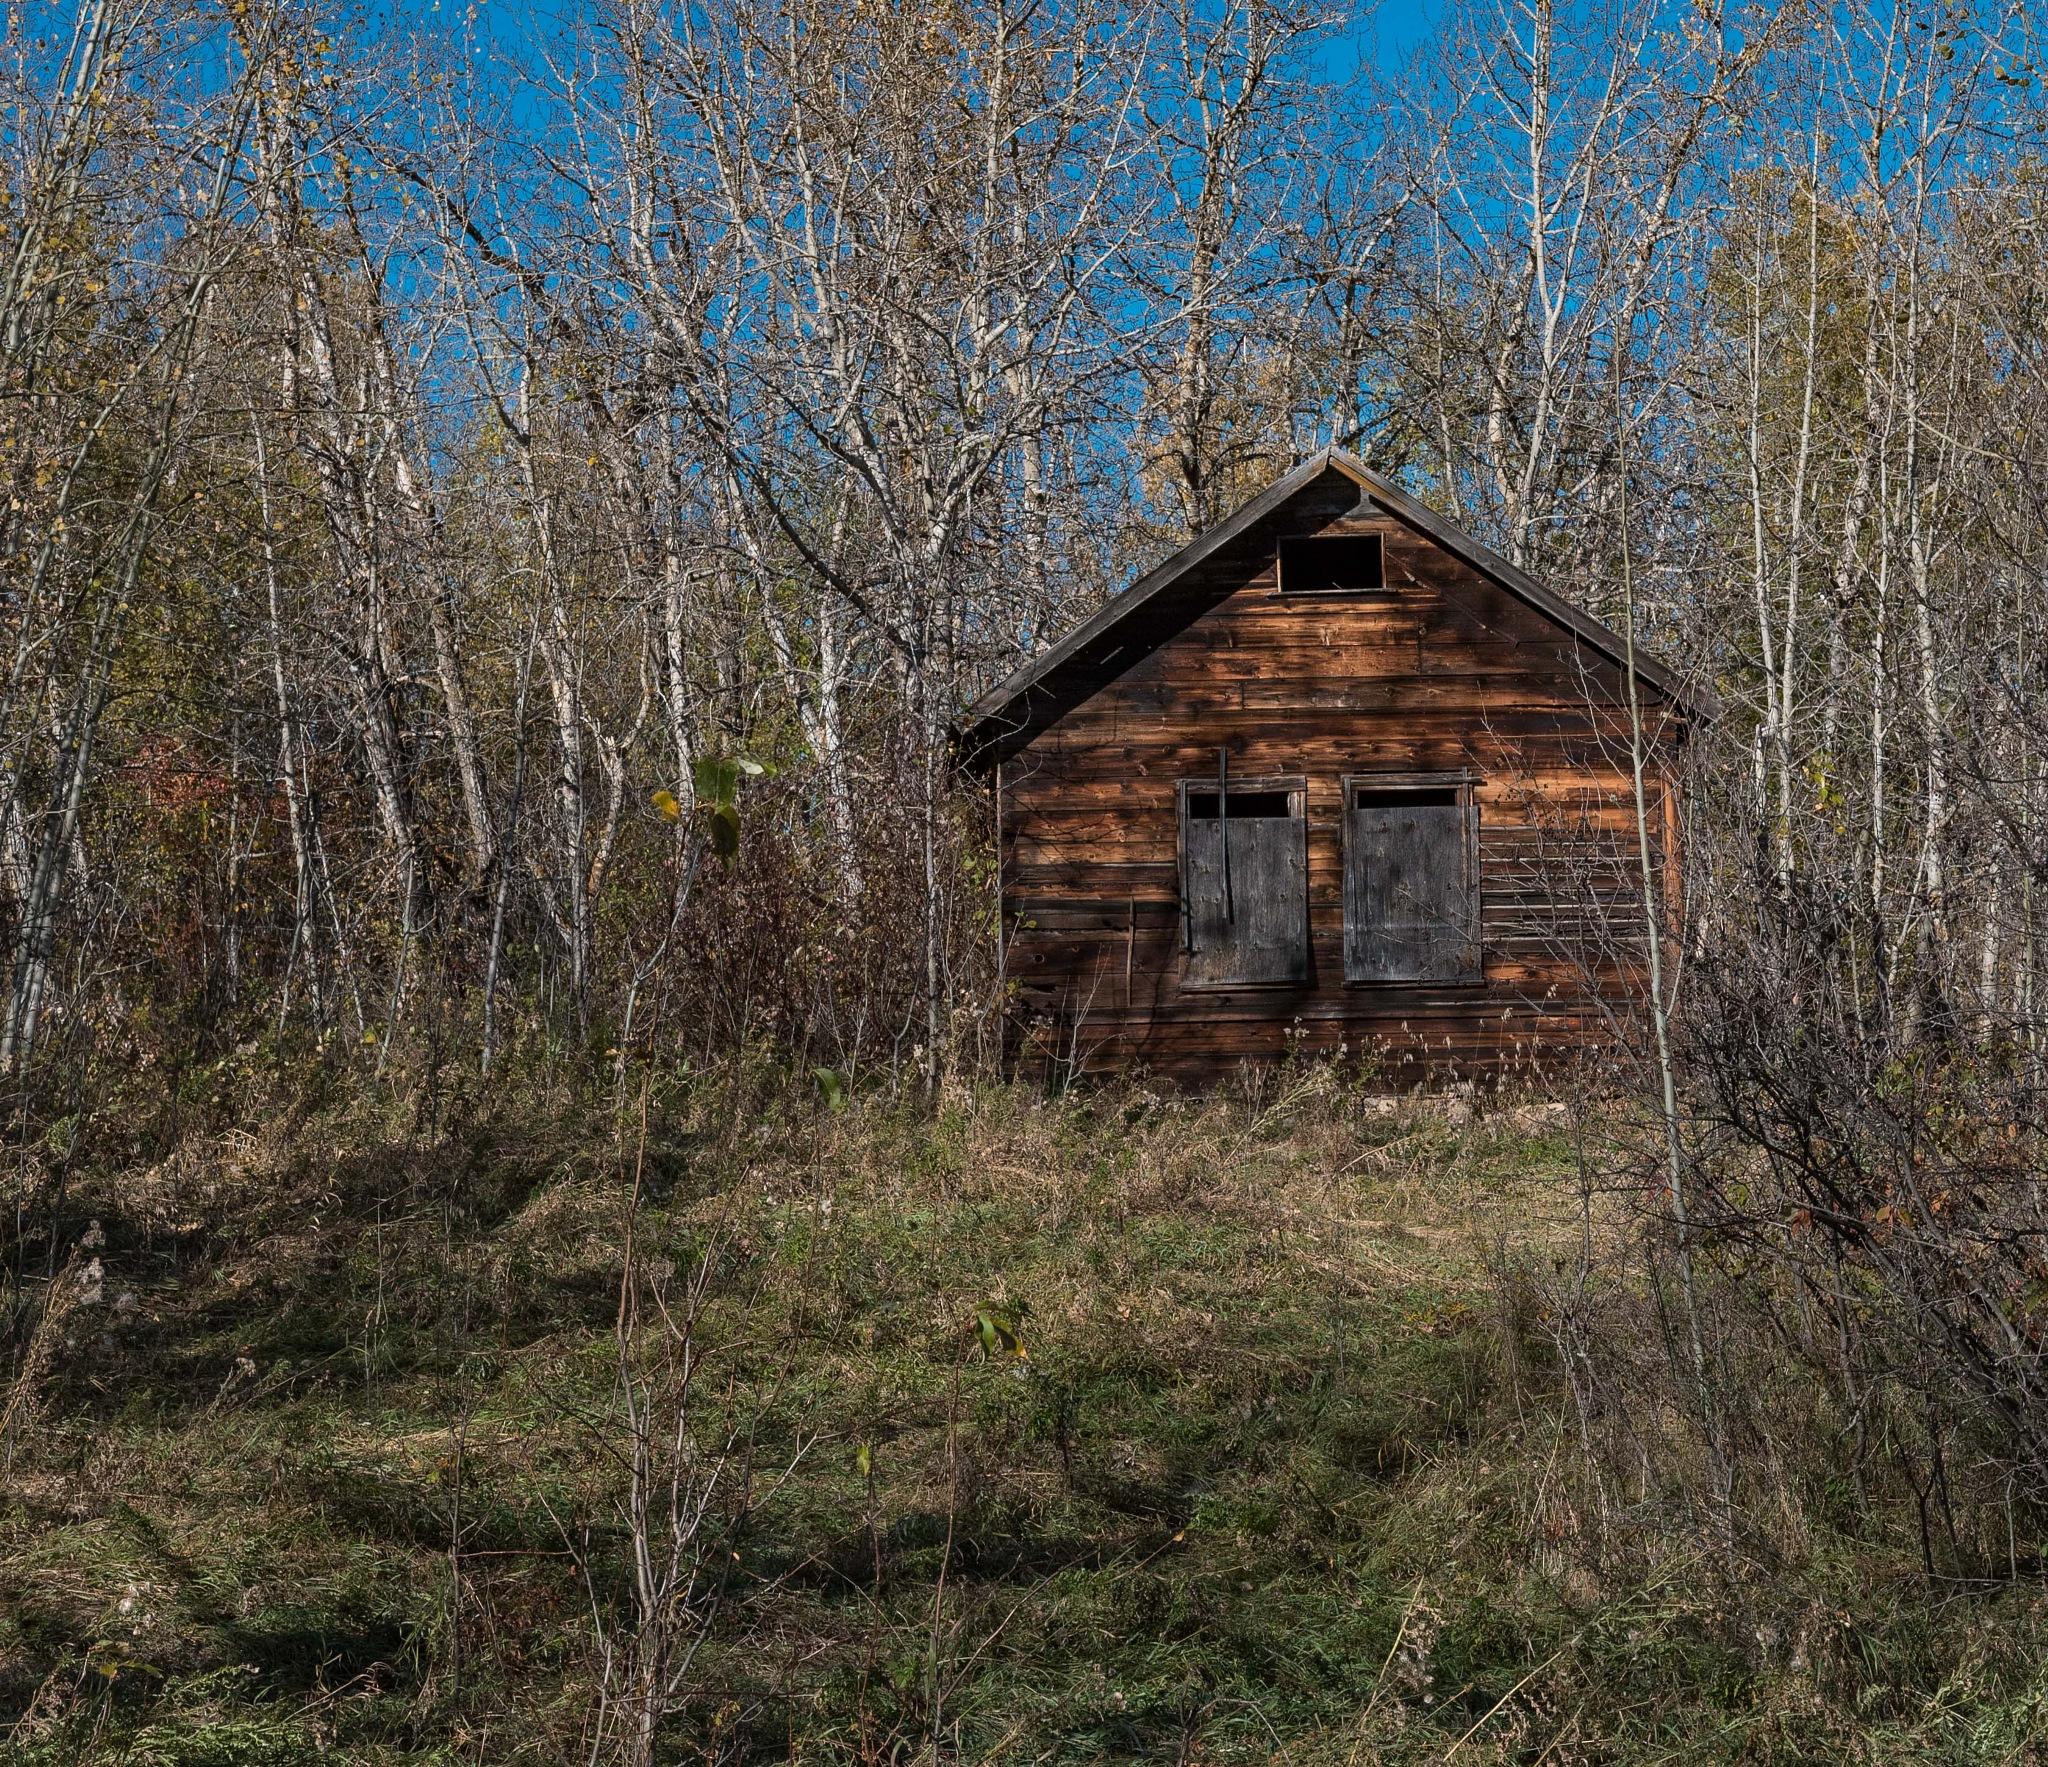 LITTLE HOUSE ON THE PRAIRIE by DrJohnHodgson